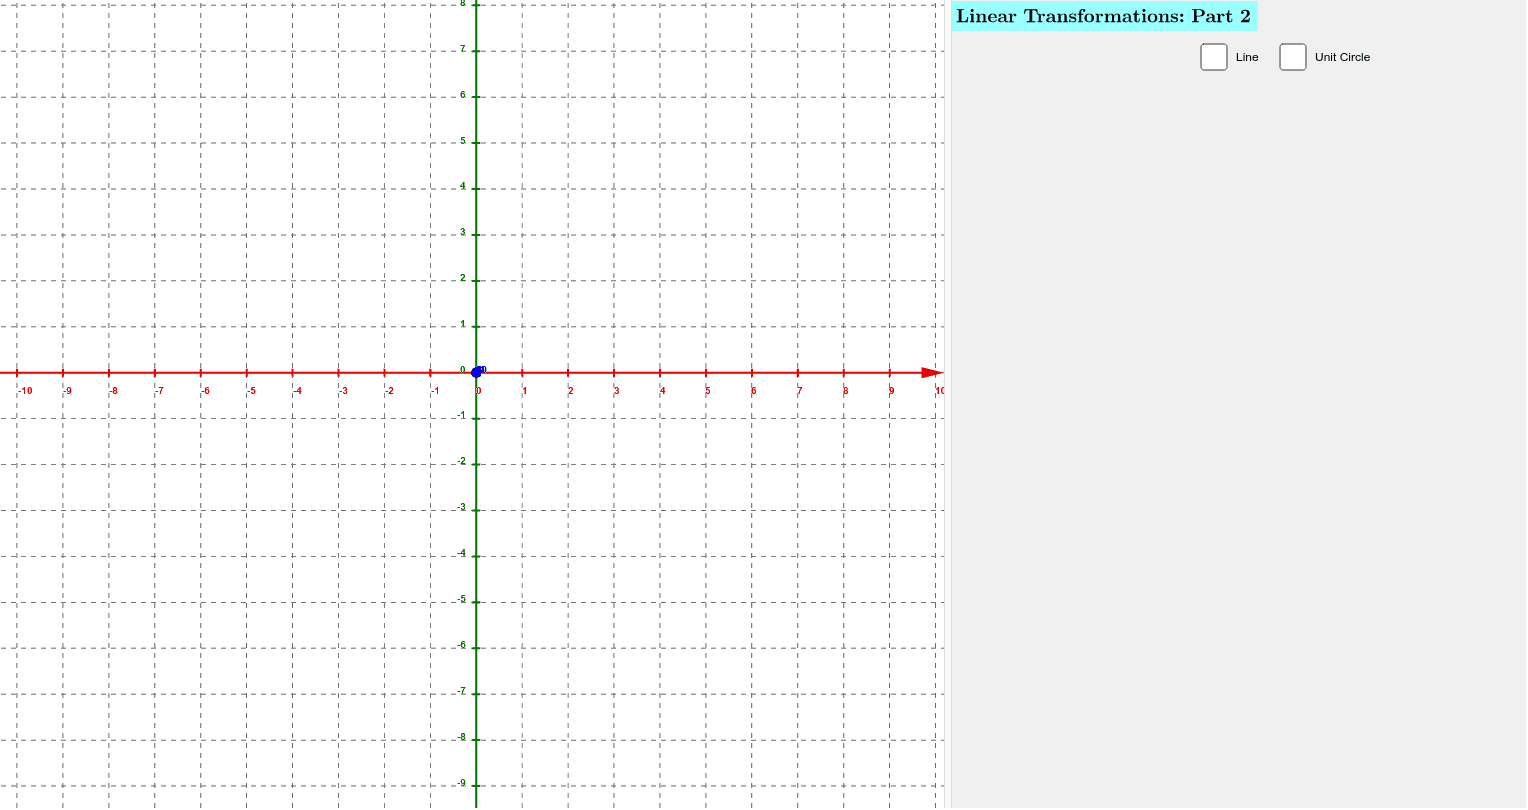 Applet - Linear Transformations - Part 2